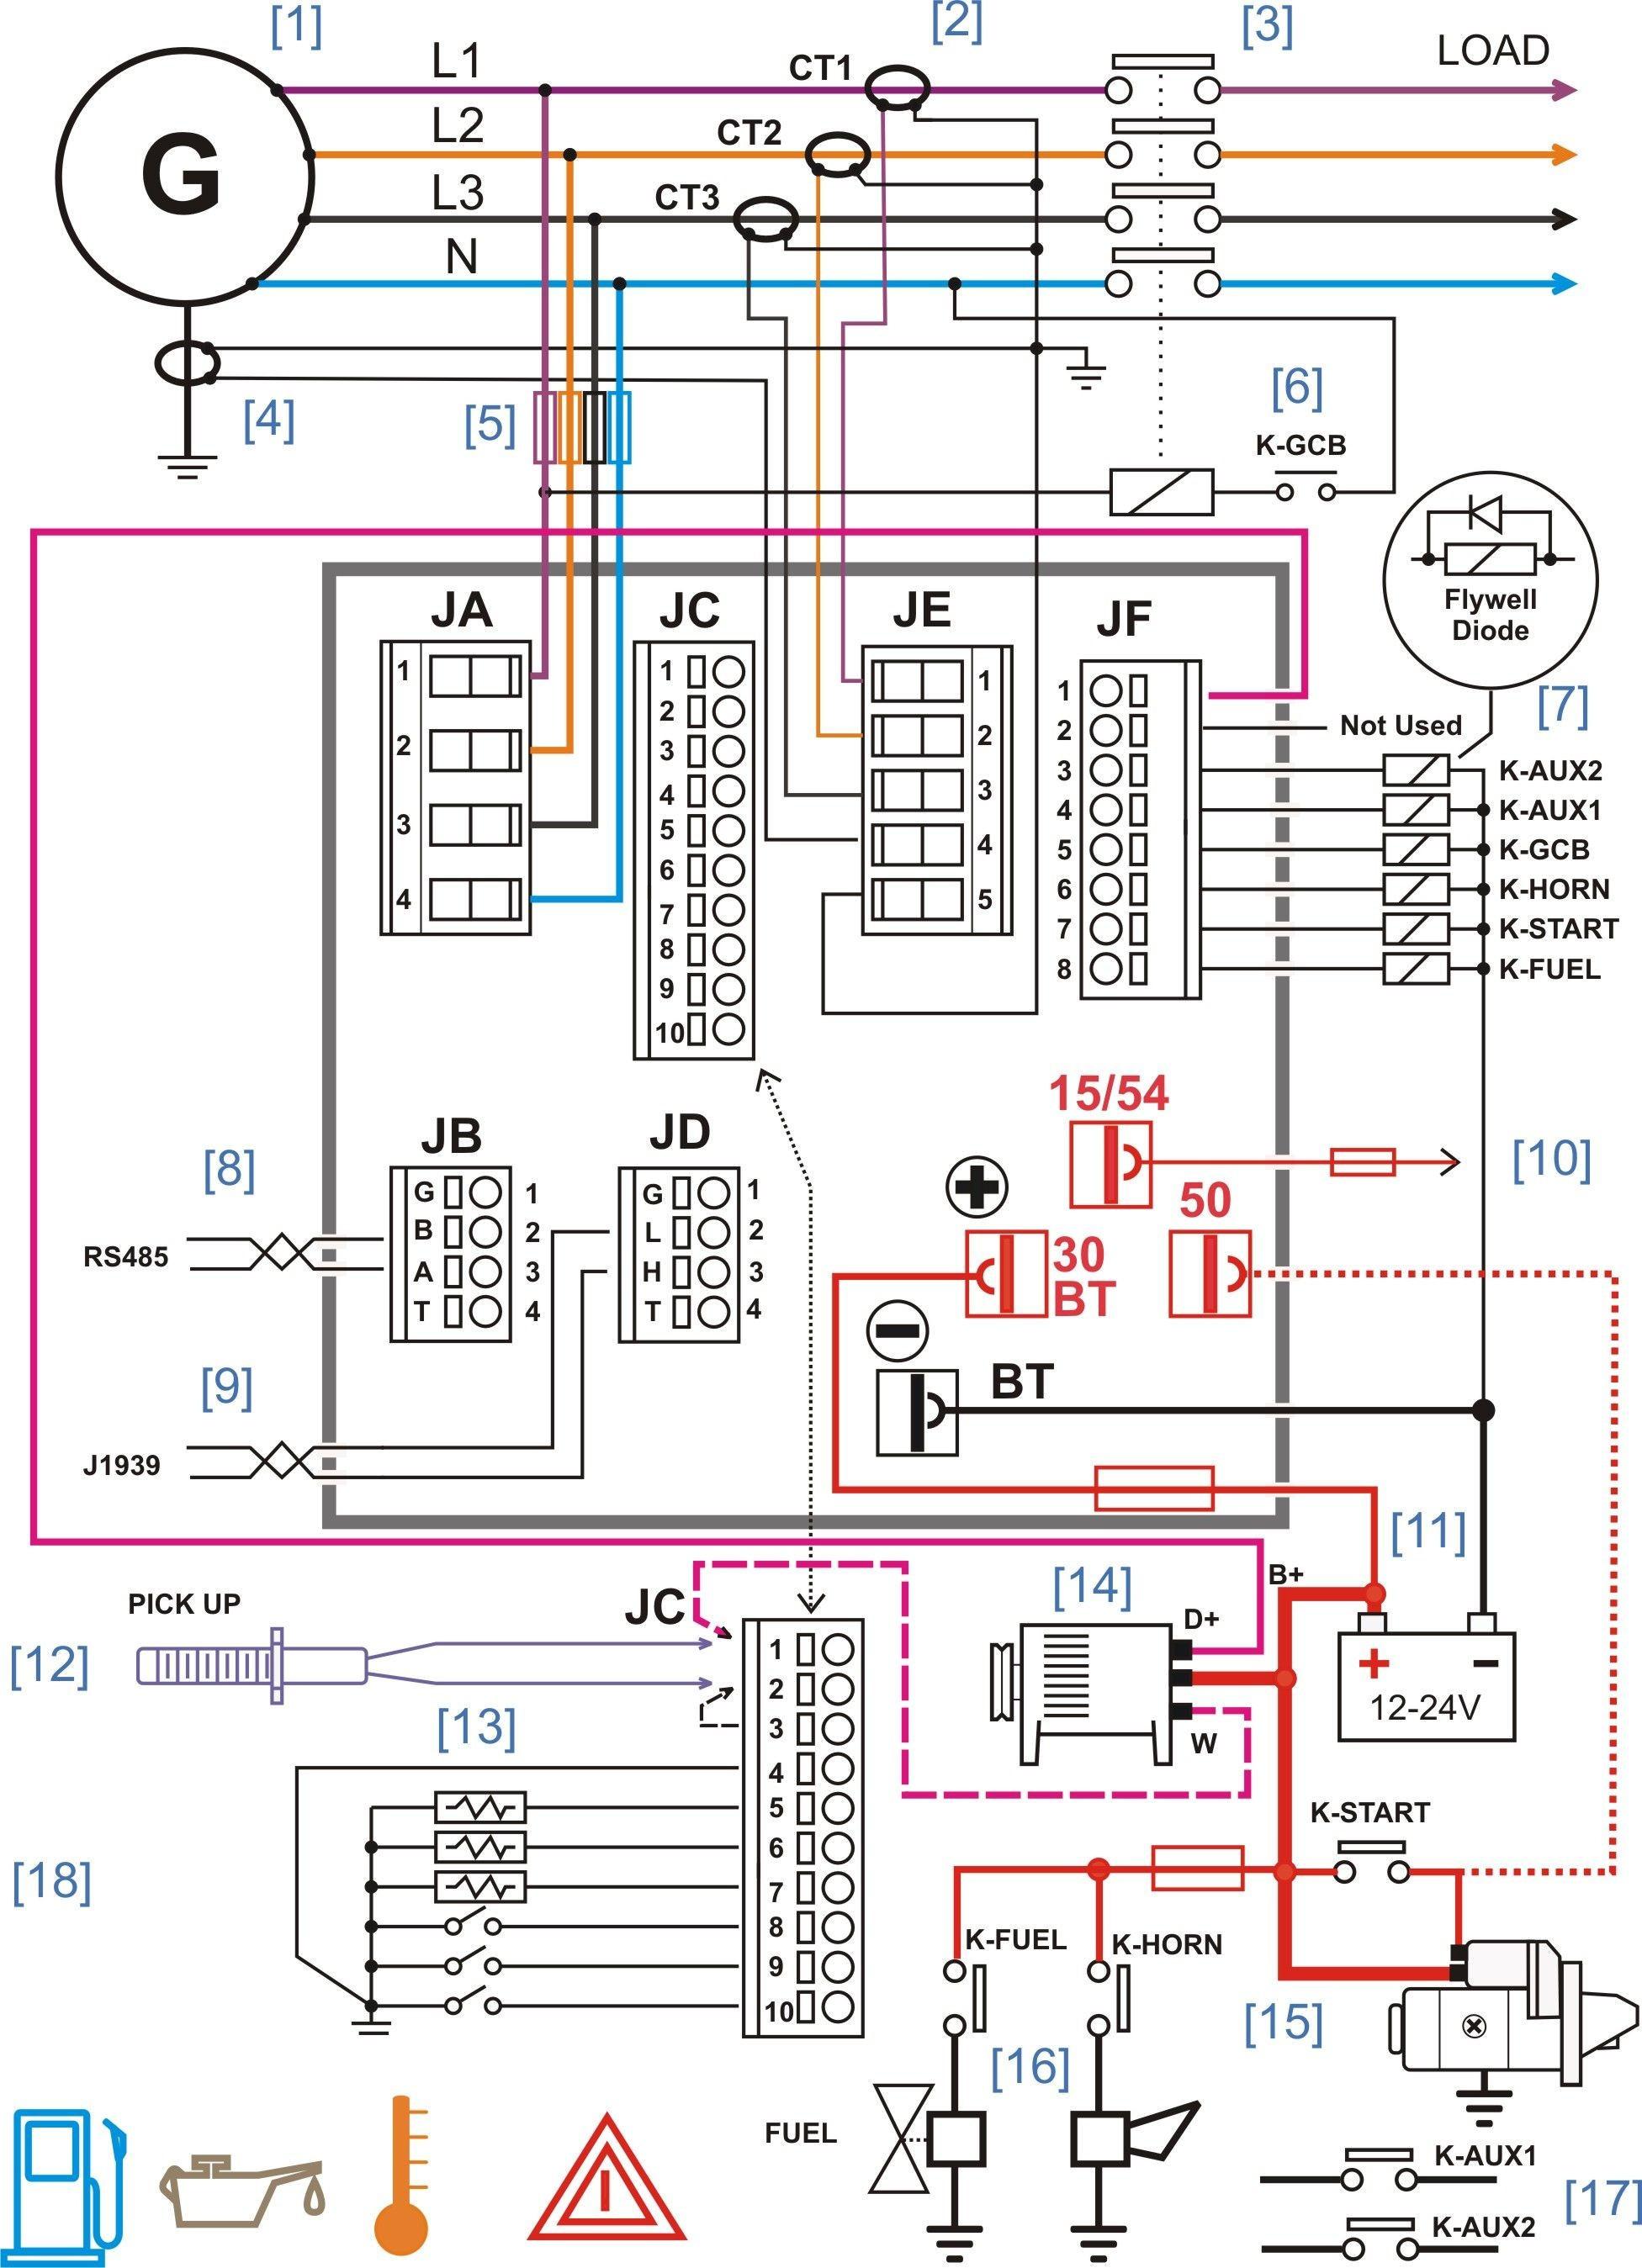 [DIAGRAM_3NM]  OE_1250] Transferswitchwiringdiagram Manual Transfer Switch Wiring Diagram  Wiring Diagram | Champion Generator Wiring Diagram |  | Ricis Crove Greas Benkeme Mohammedshrine Librar Wiring 101